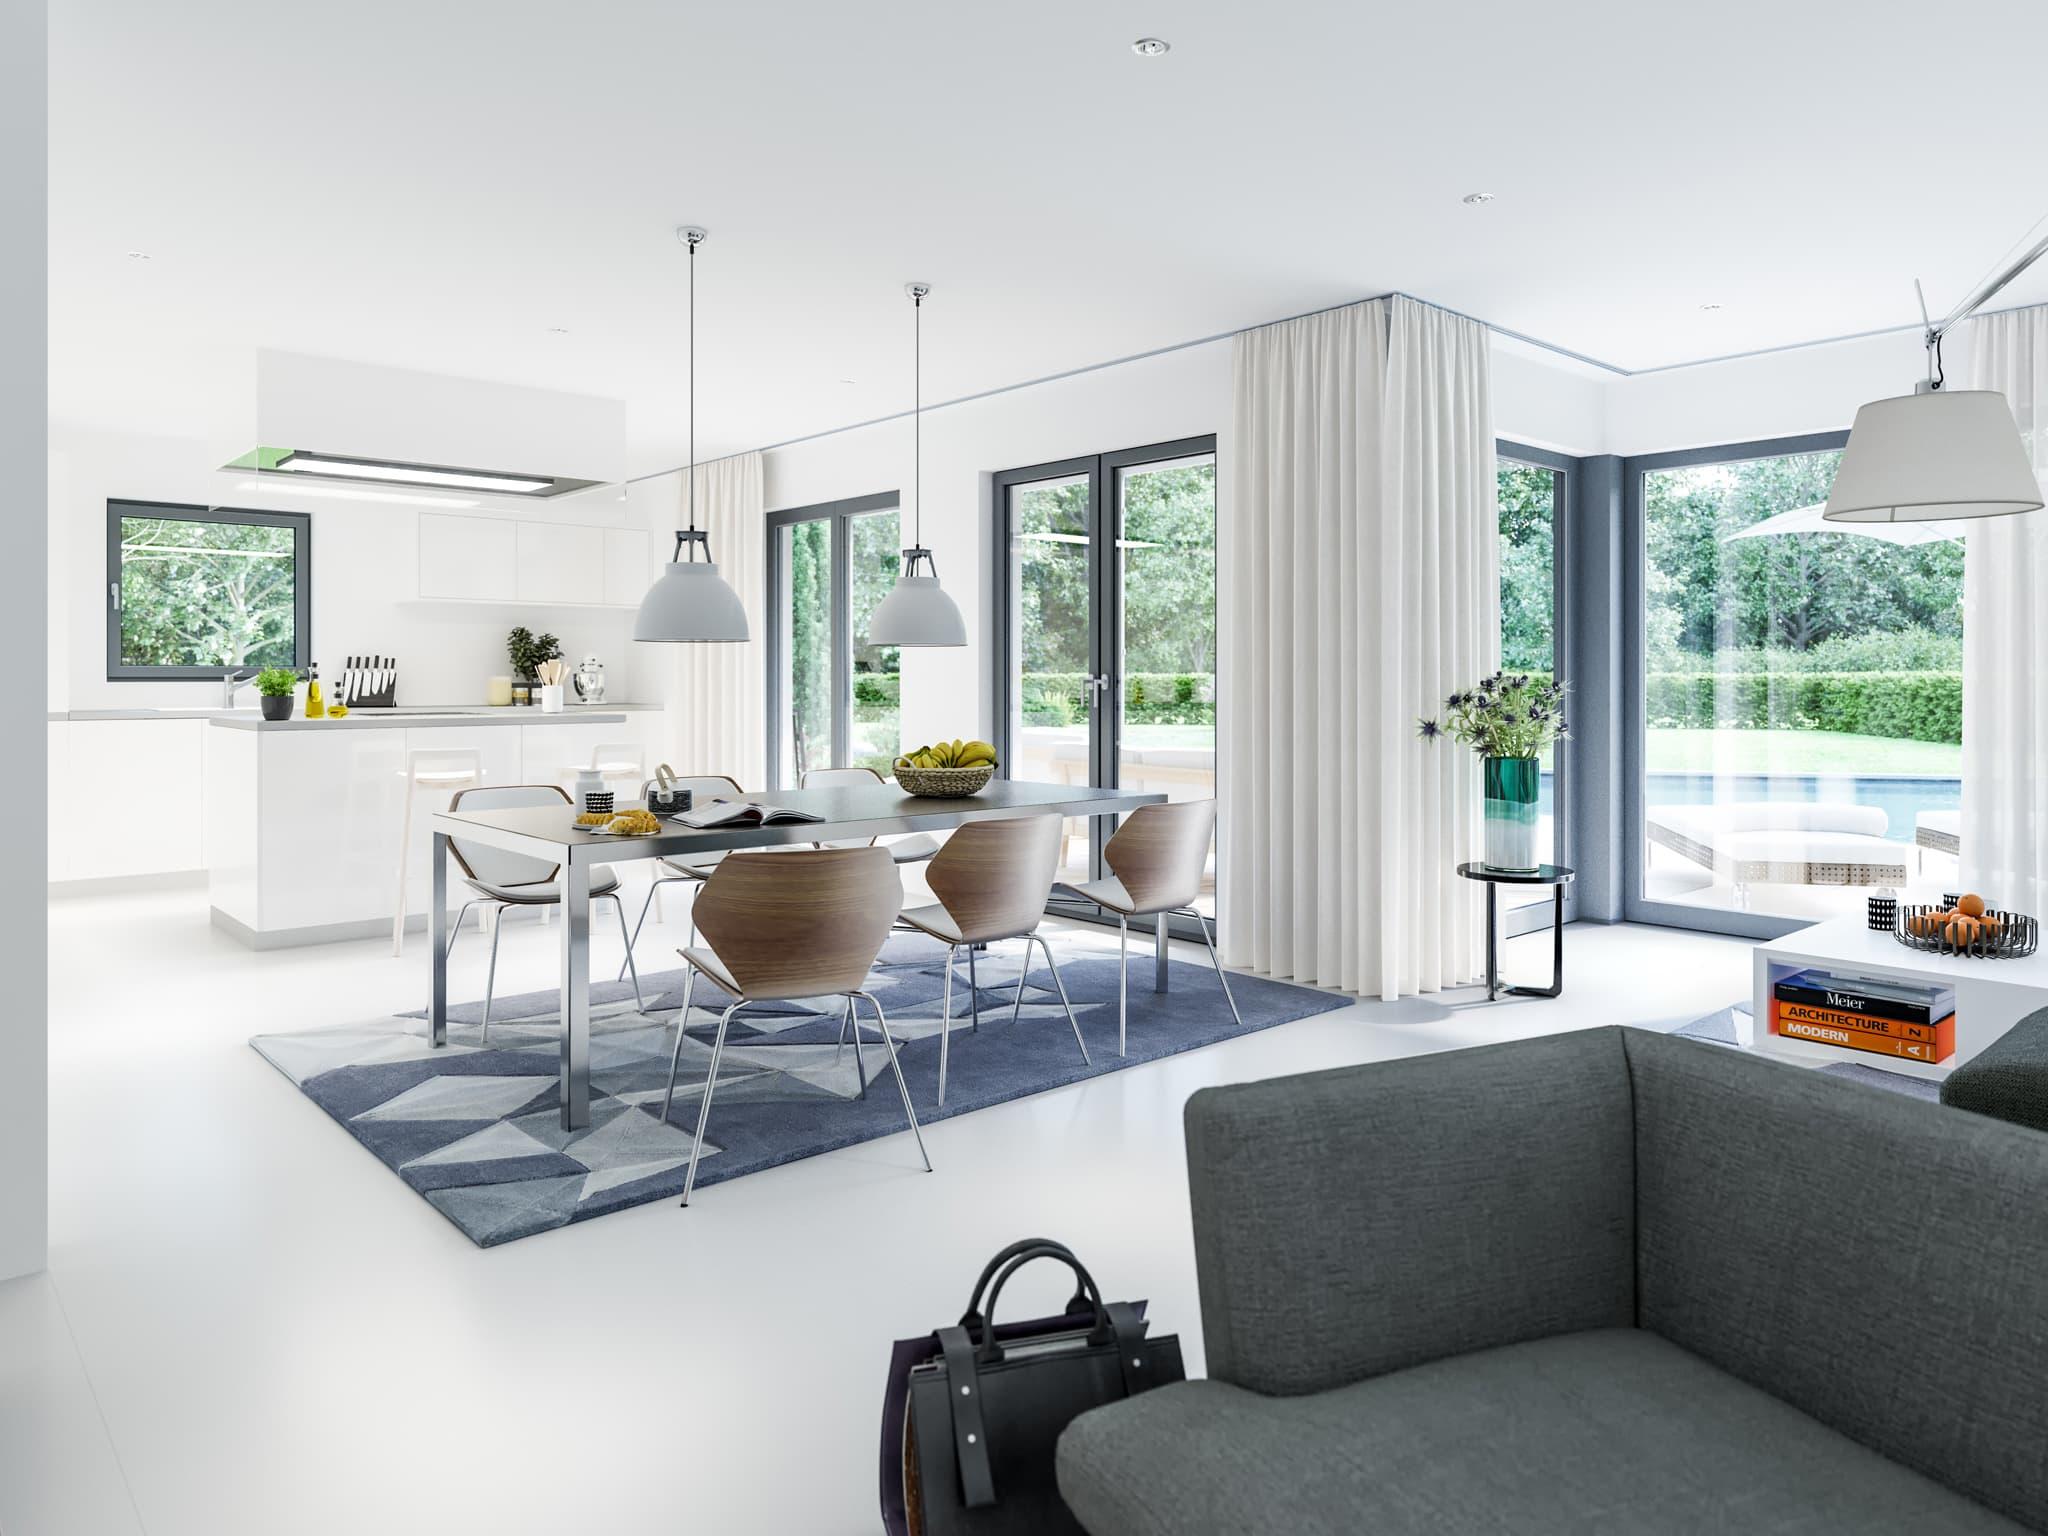 Offenes Wohn-Esszimmer - Einfamilienhaus Ideen Inneneinrichtung Fertighaus Living Haus SUNSHINE 143 V2 - HausbauDirekt.de